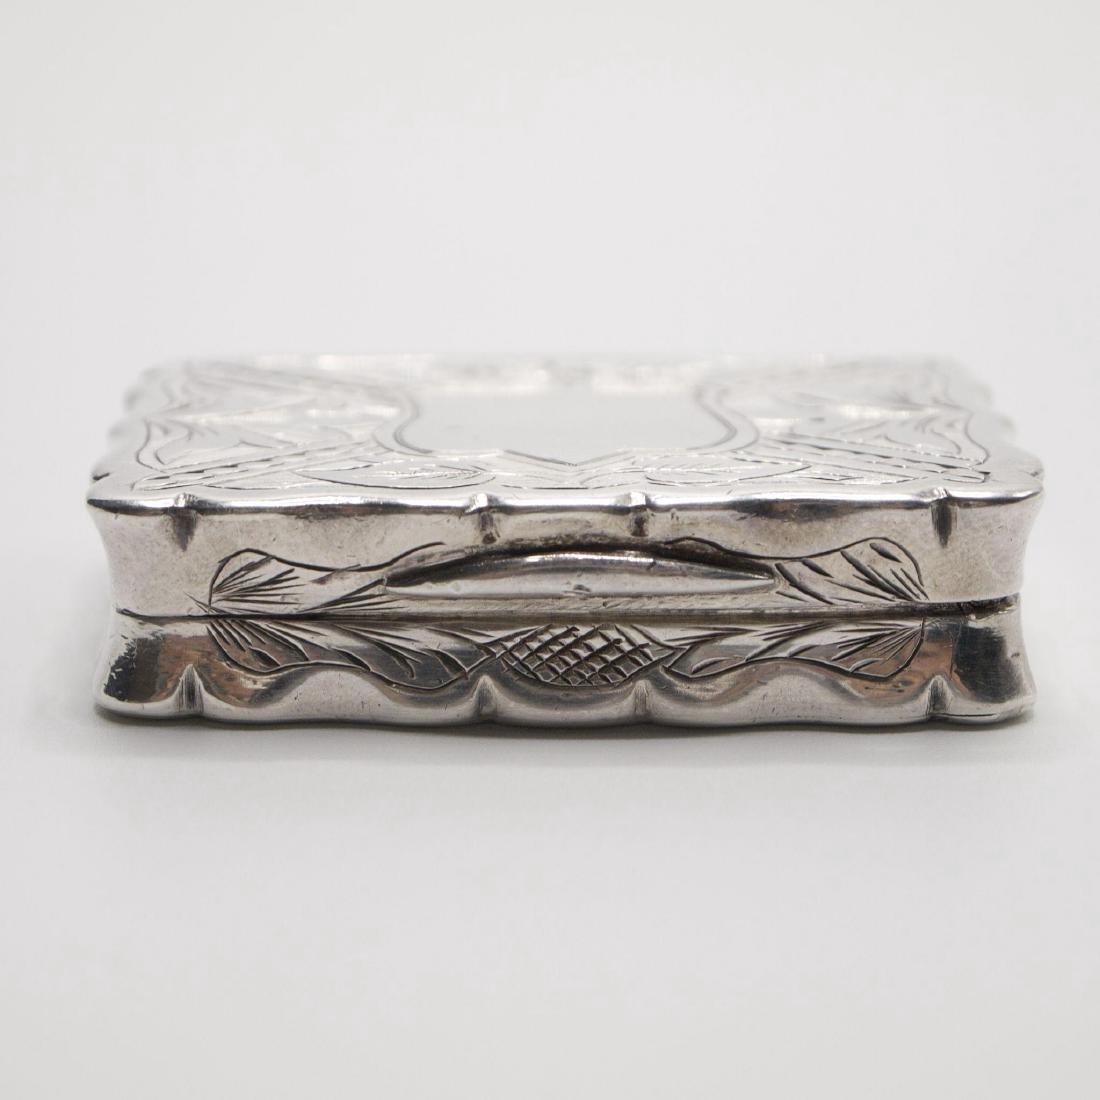 Antique Victorian Sterling Silver Vinaigrette, 1875 - 4